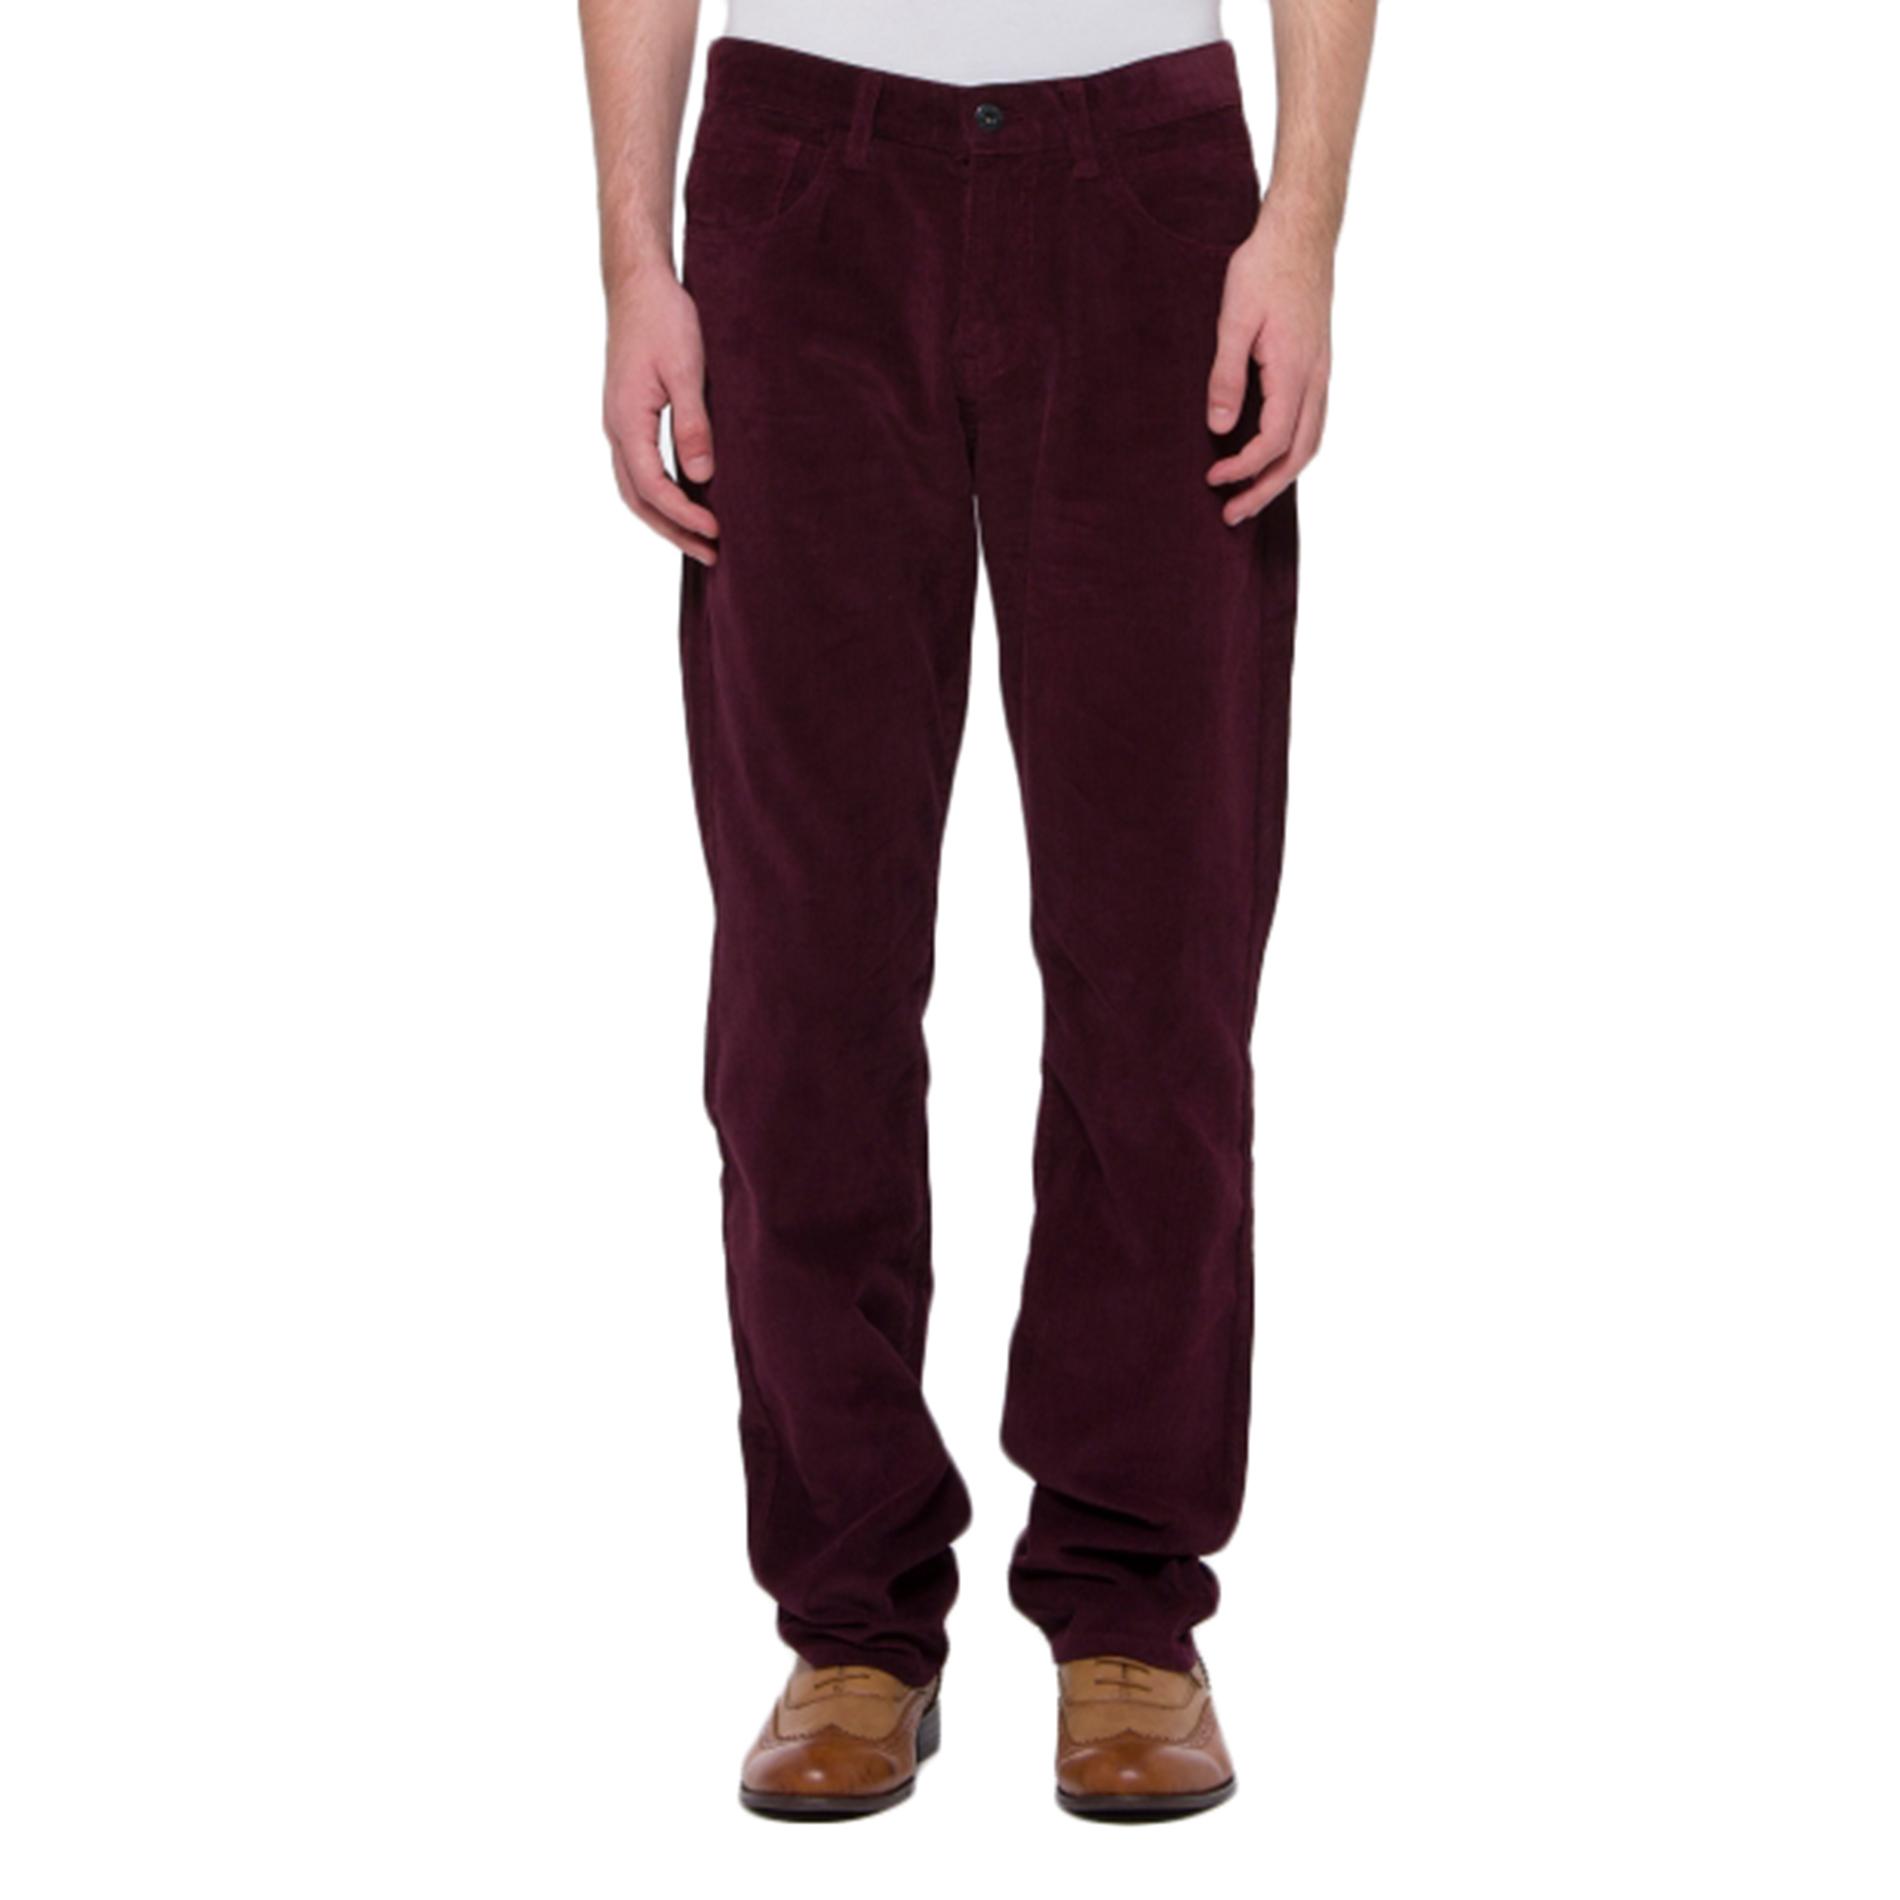 "Bossini Mens Reliable Casual Snug Slim Fit Colourful Corduroy Pants,Waist 28-40"""